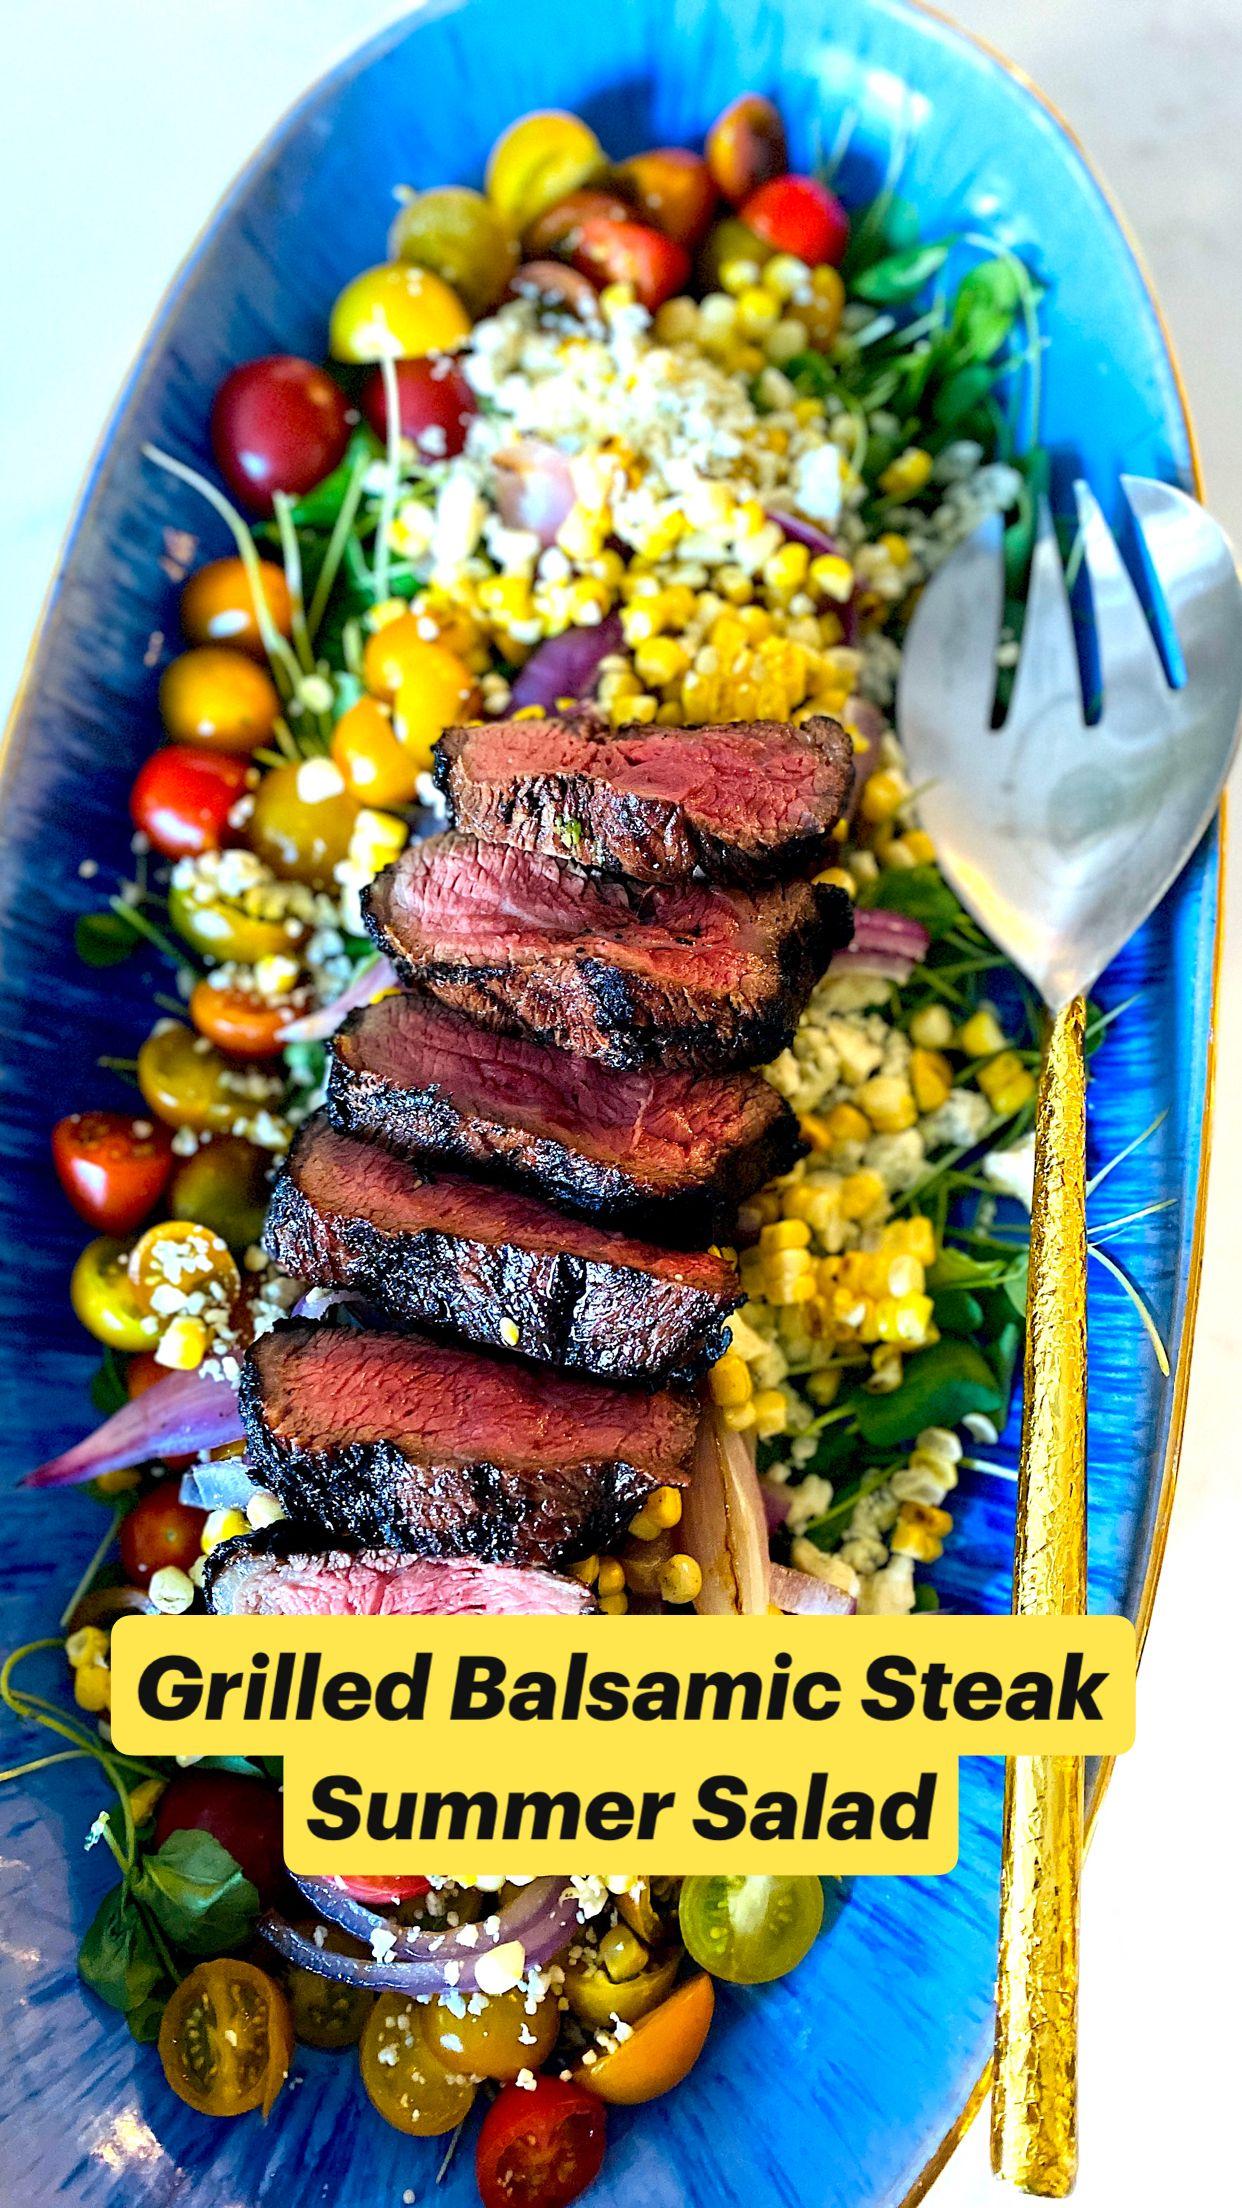 Grilled Balsamic Steak Summer Salad